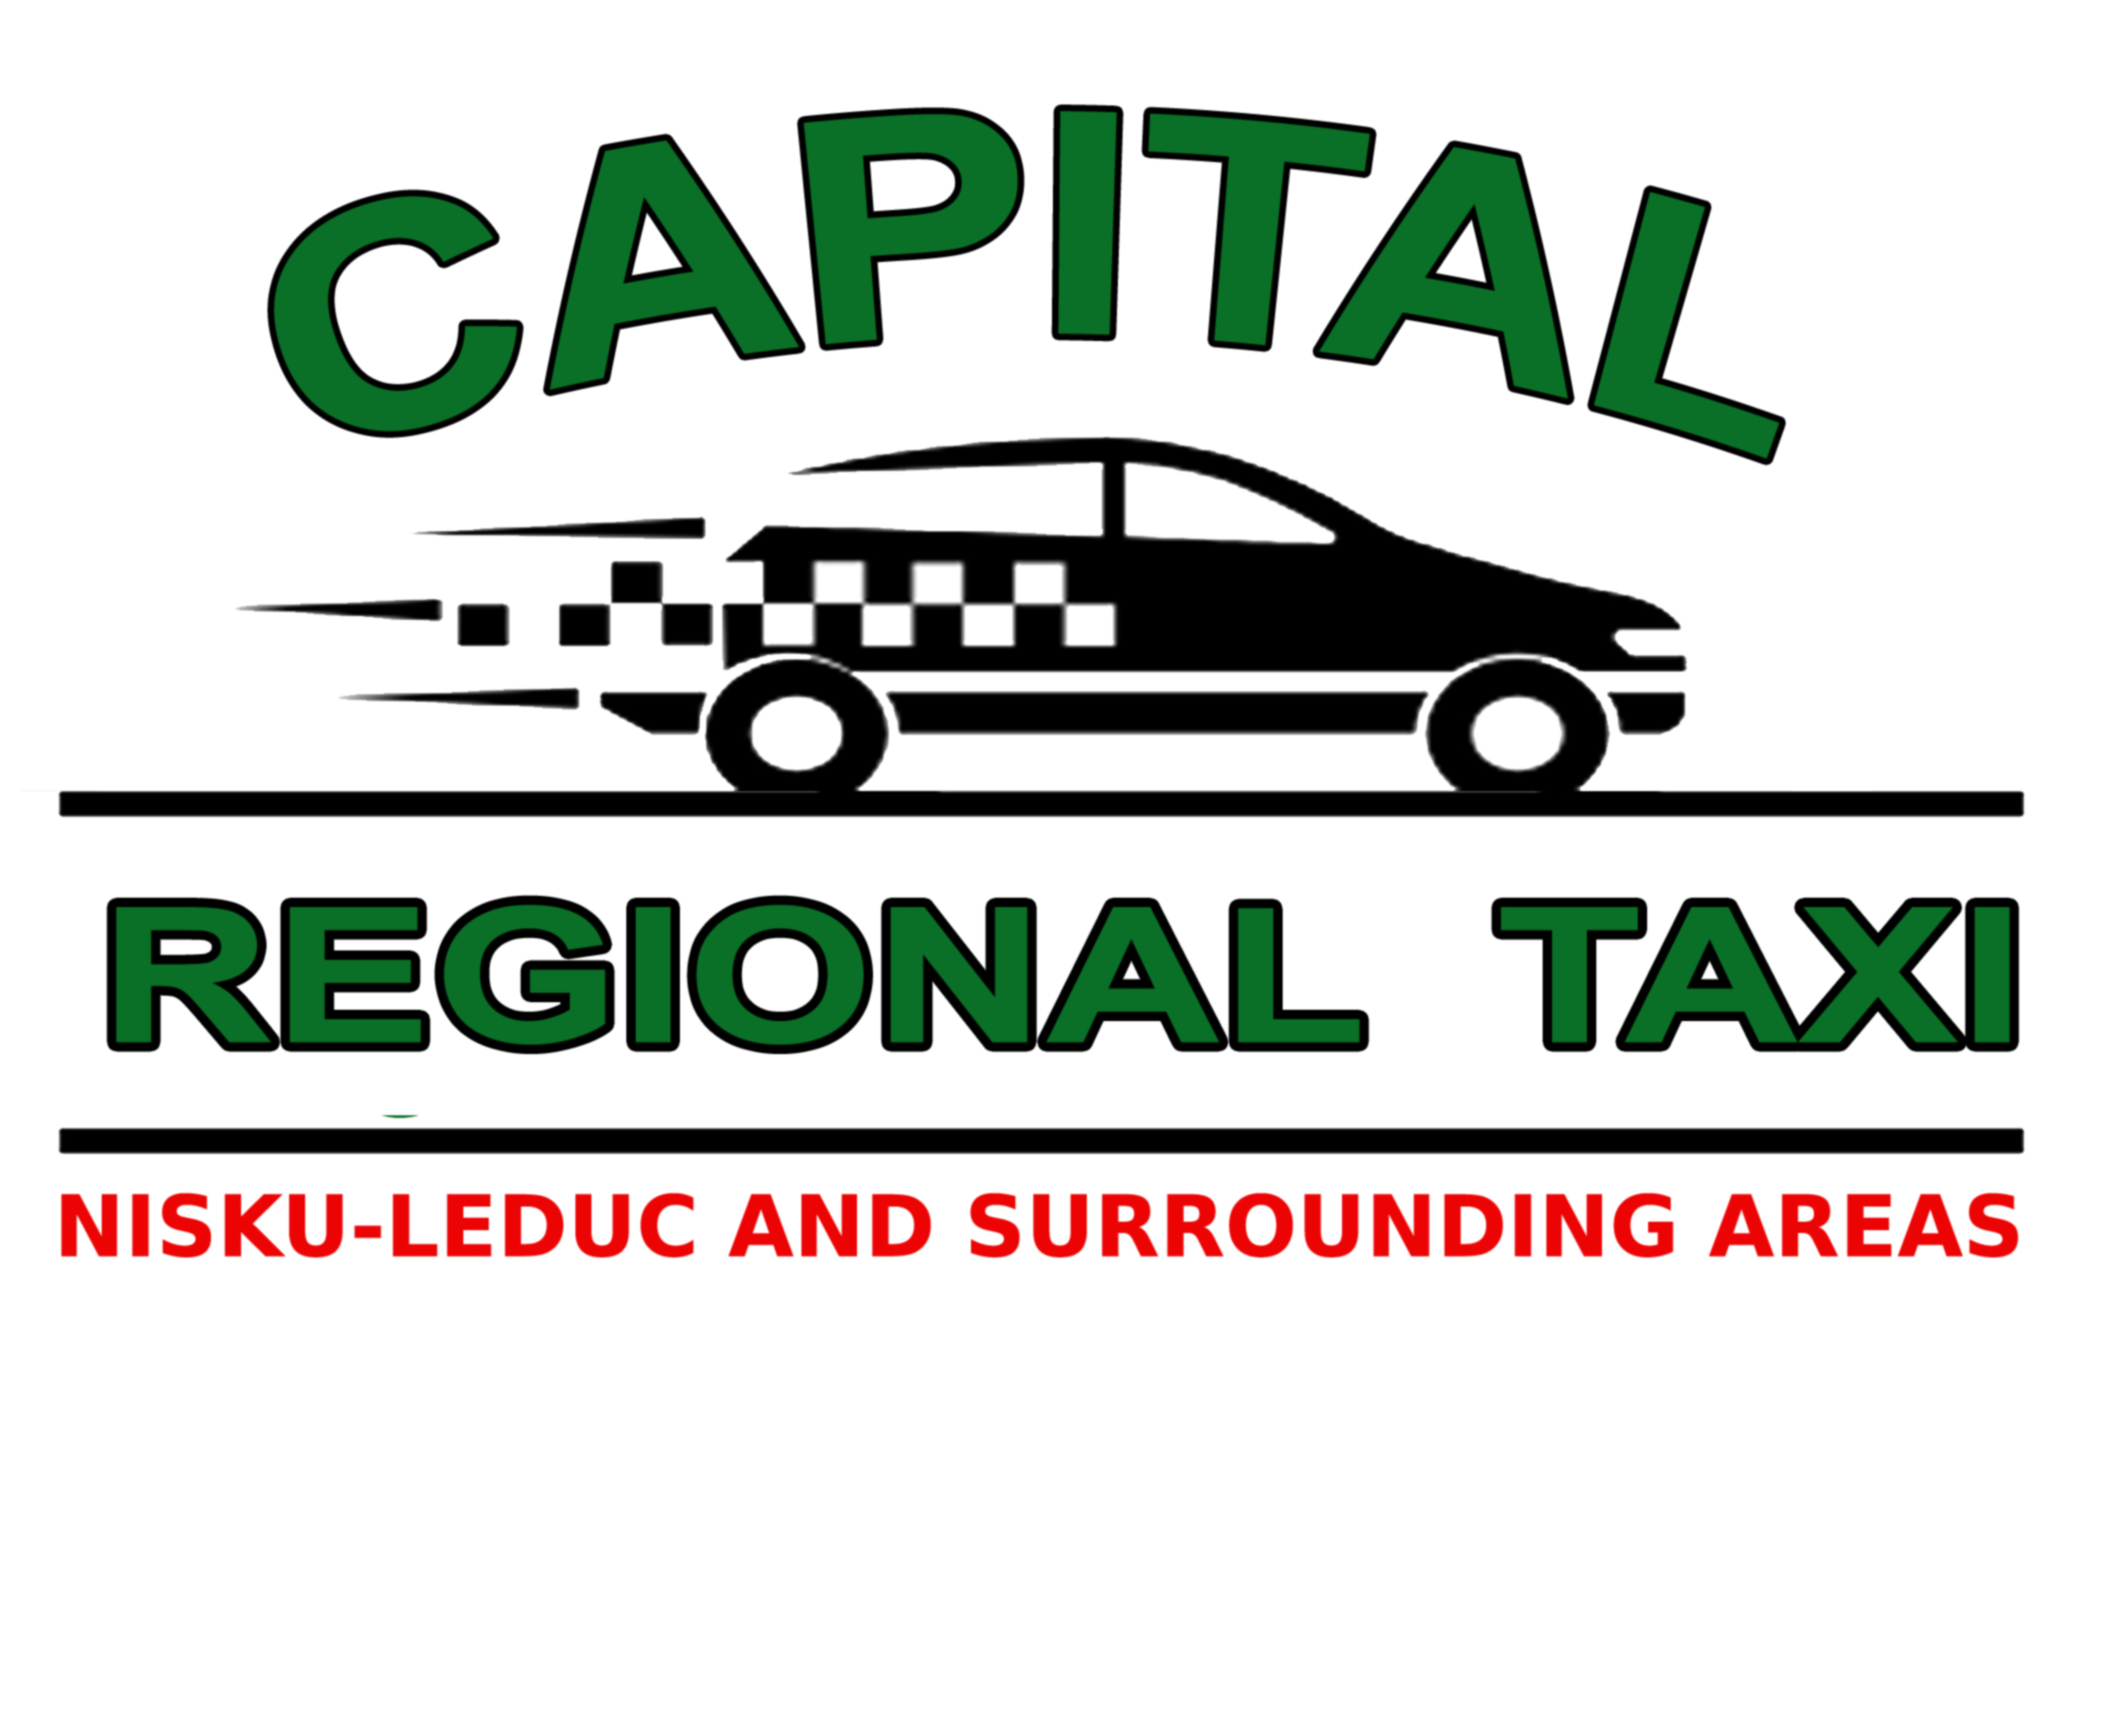 Capital Regional Taxi